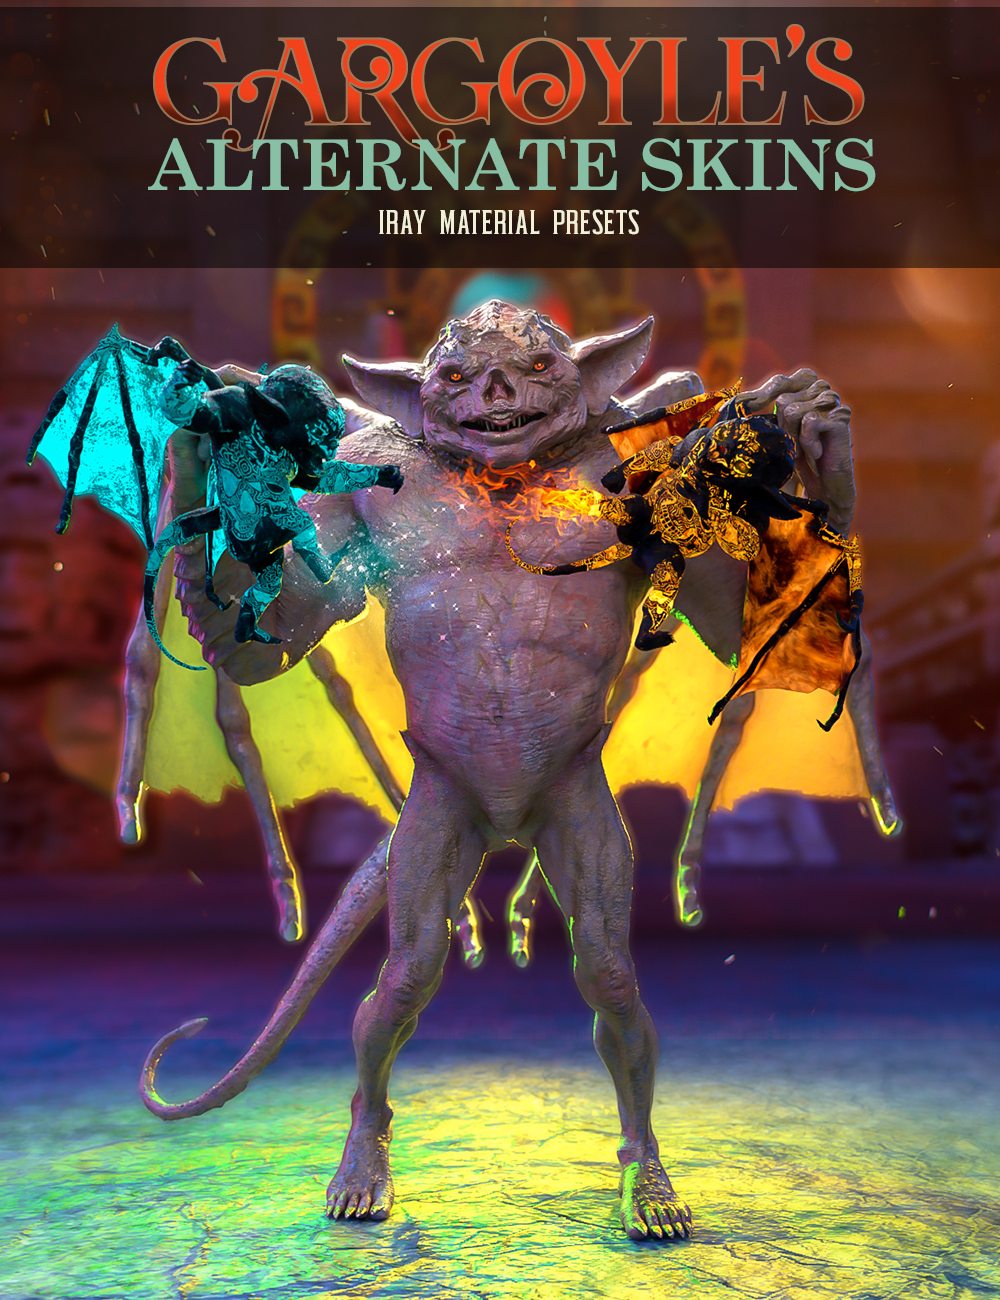 Gargoyle's Alternate Skins by: EsidFenixPhoenix, 3D Models by Daz 3D